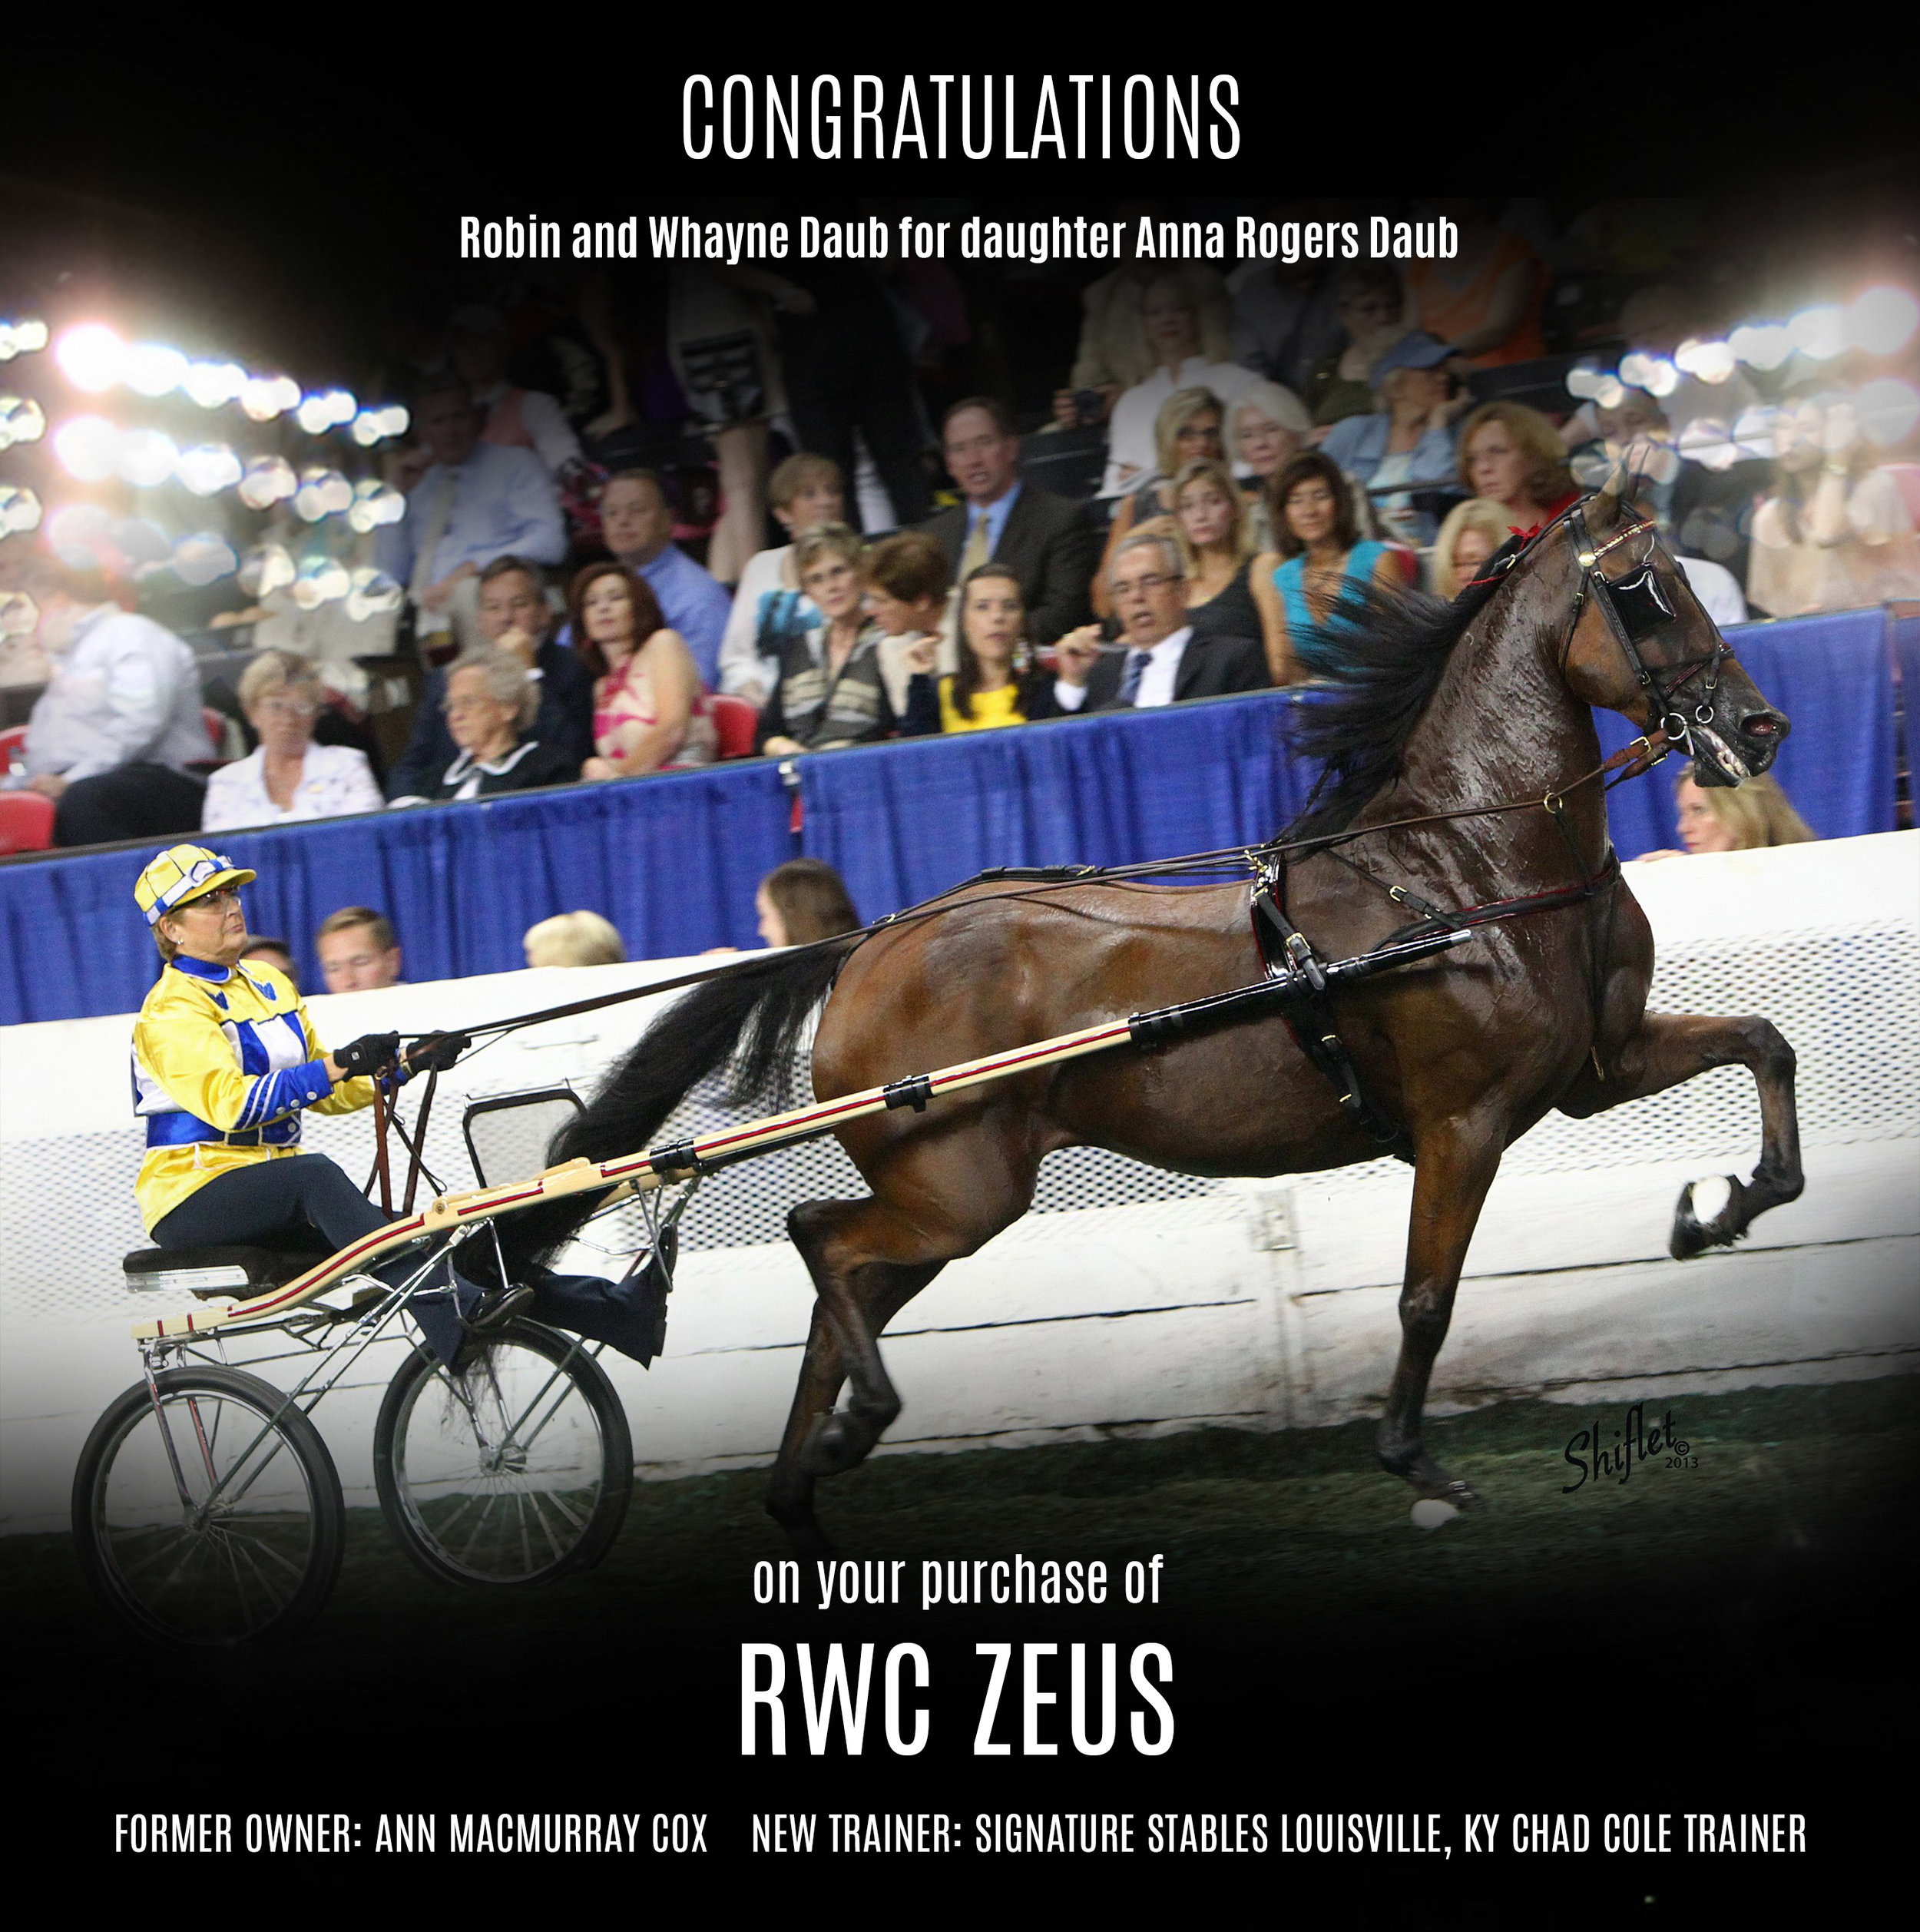 RWC Zeus.jpg